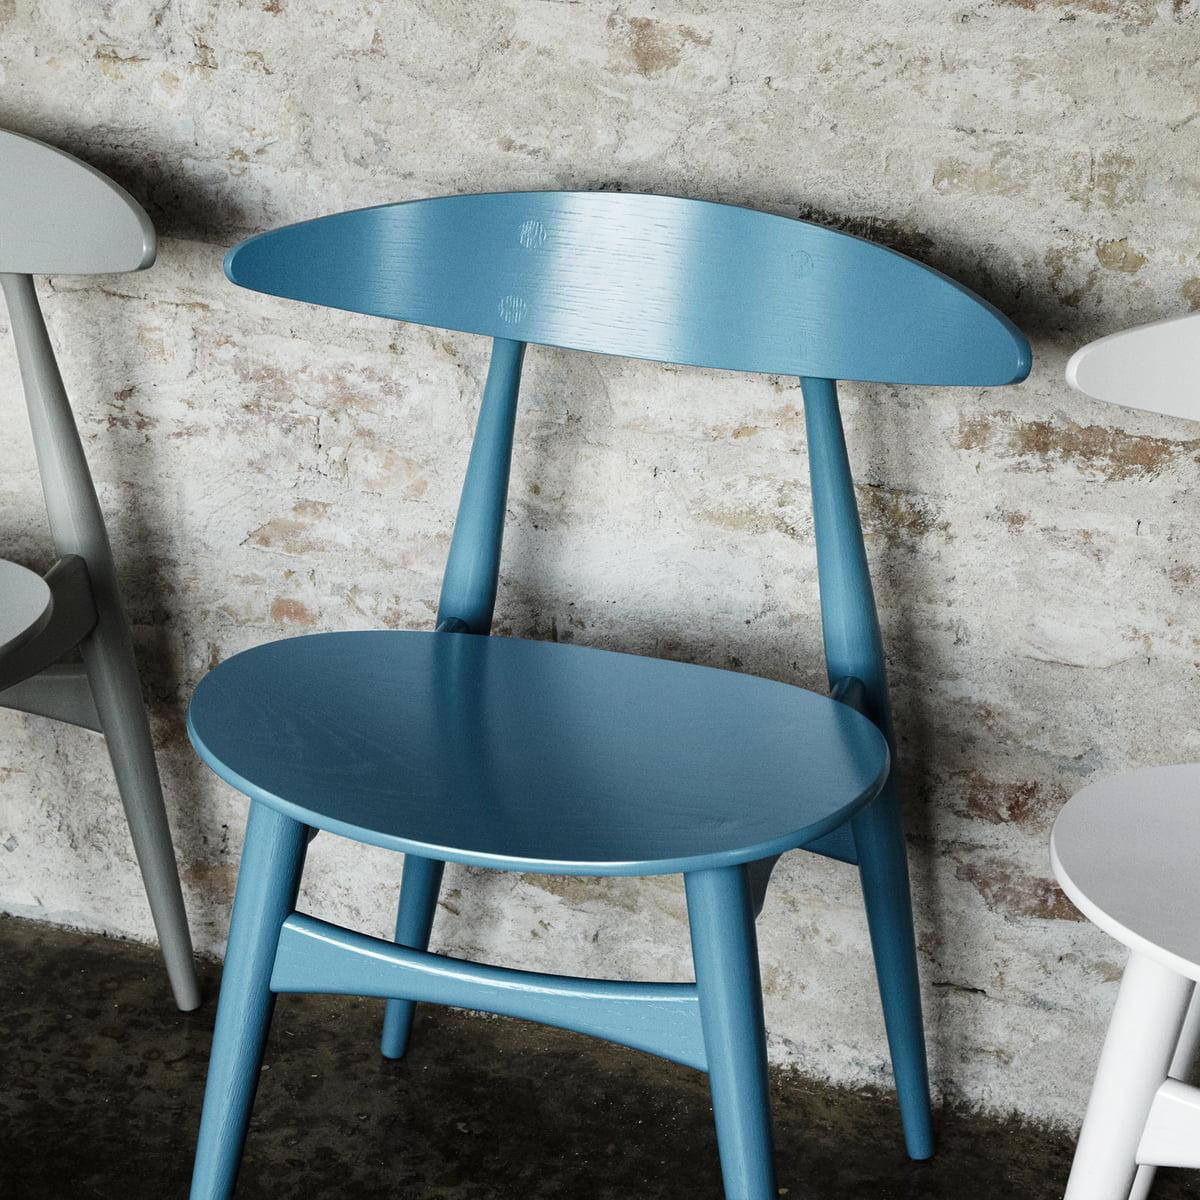 carl hansen ch33 t stuhl bei. Black Bedroom Furniture Sets. Home Design Ideas